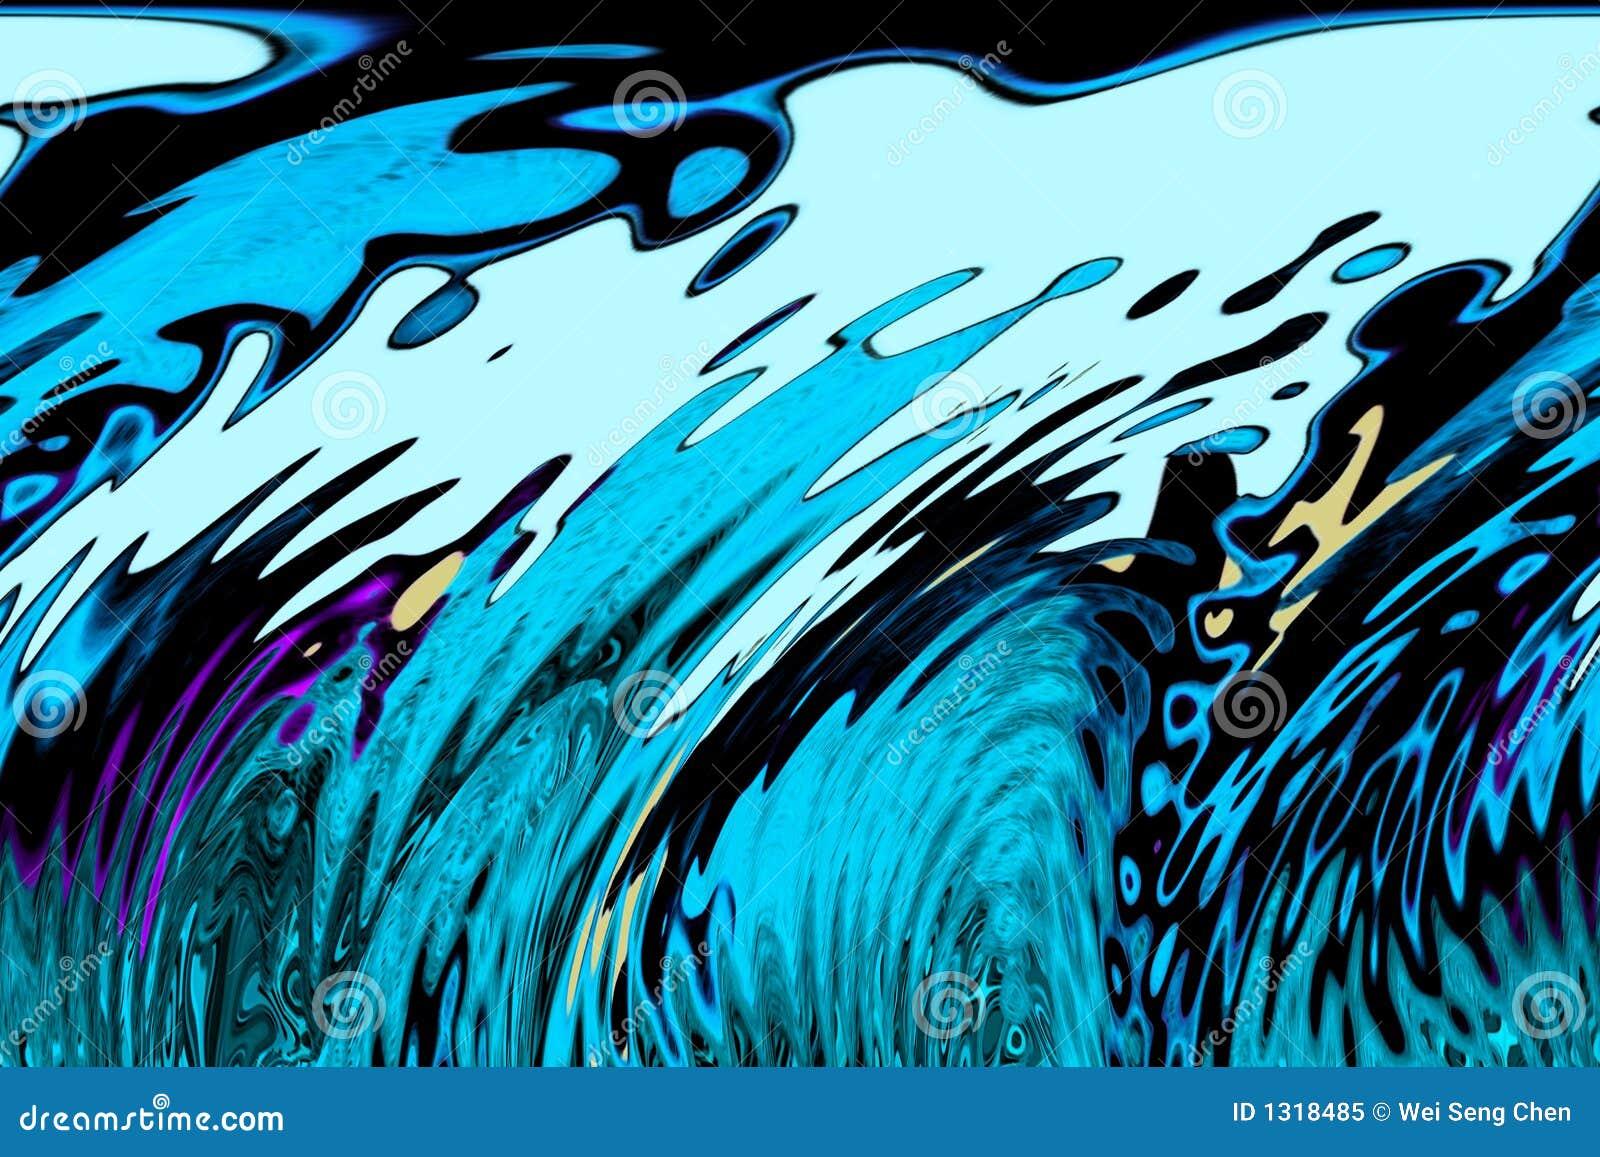 Tsunamiwaves